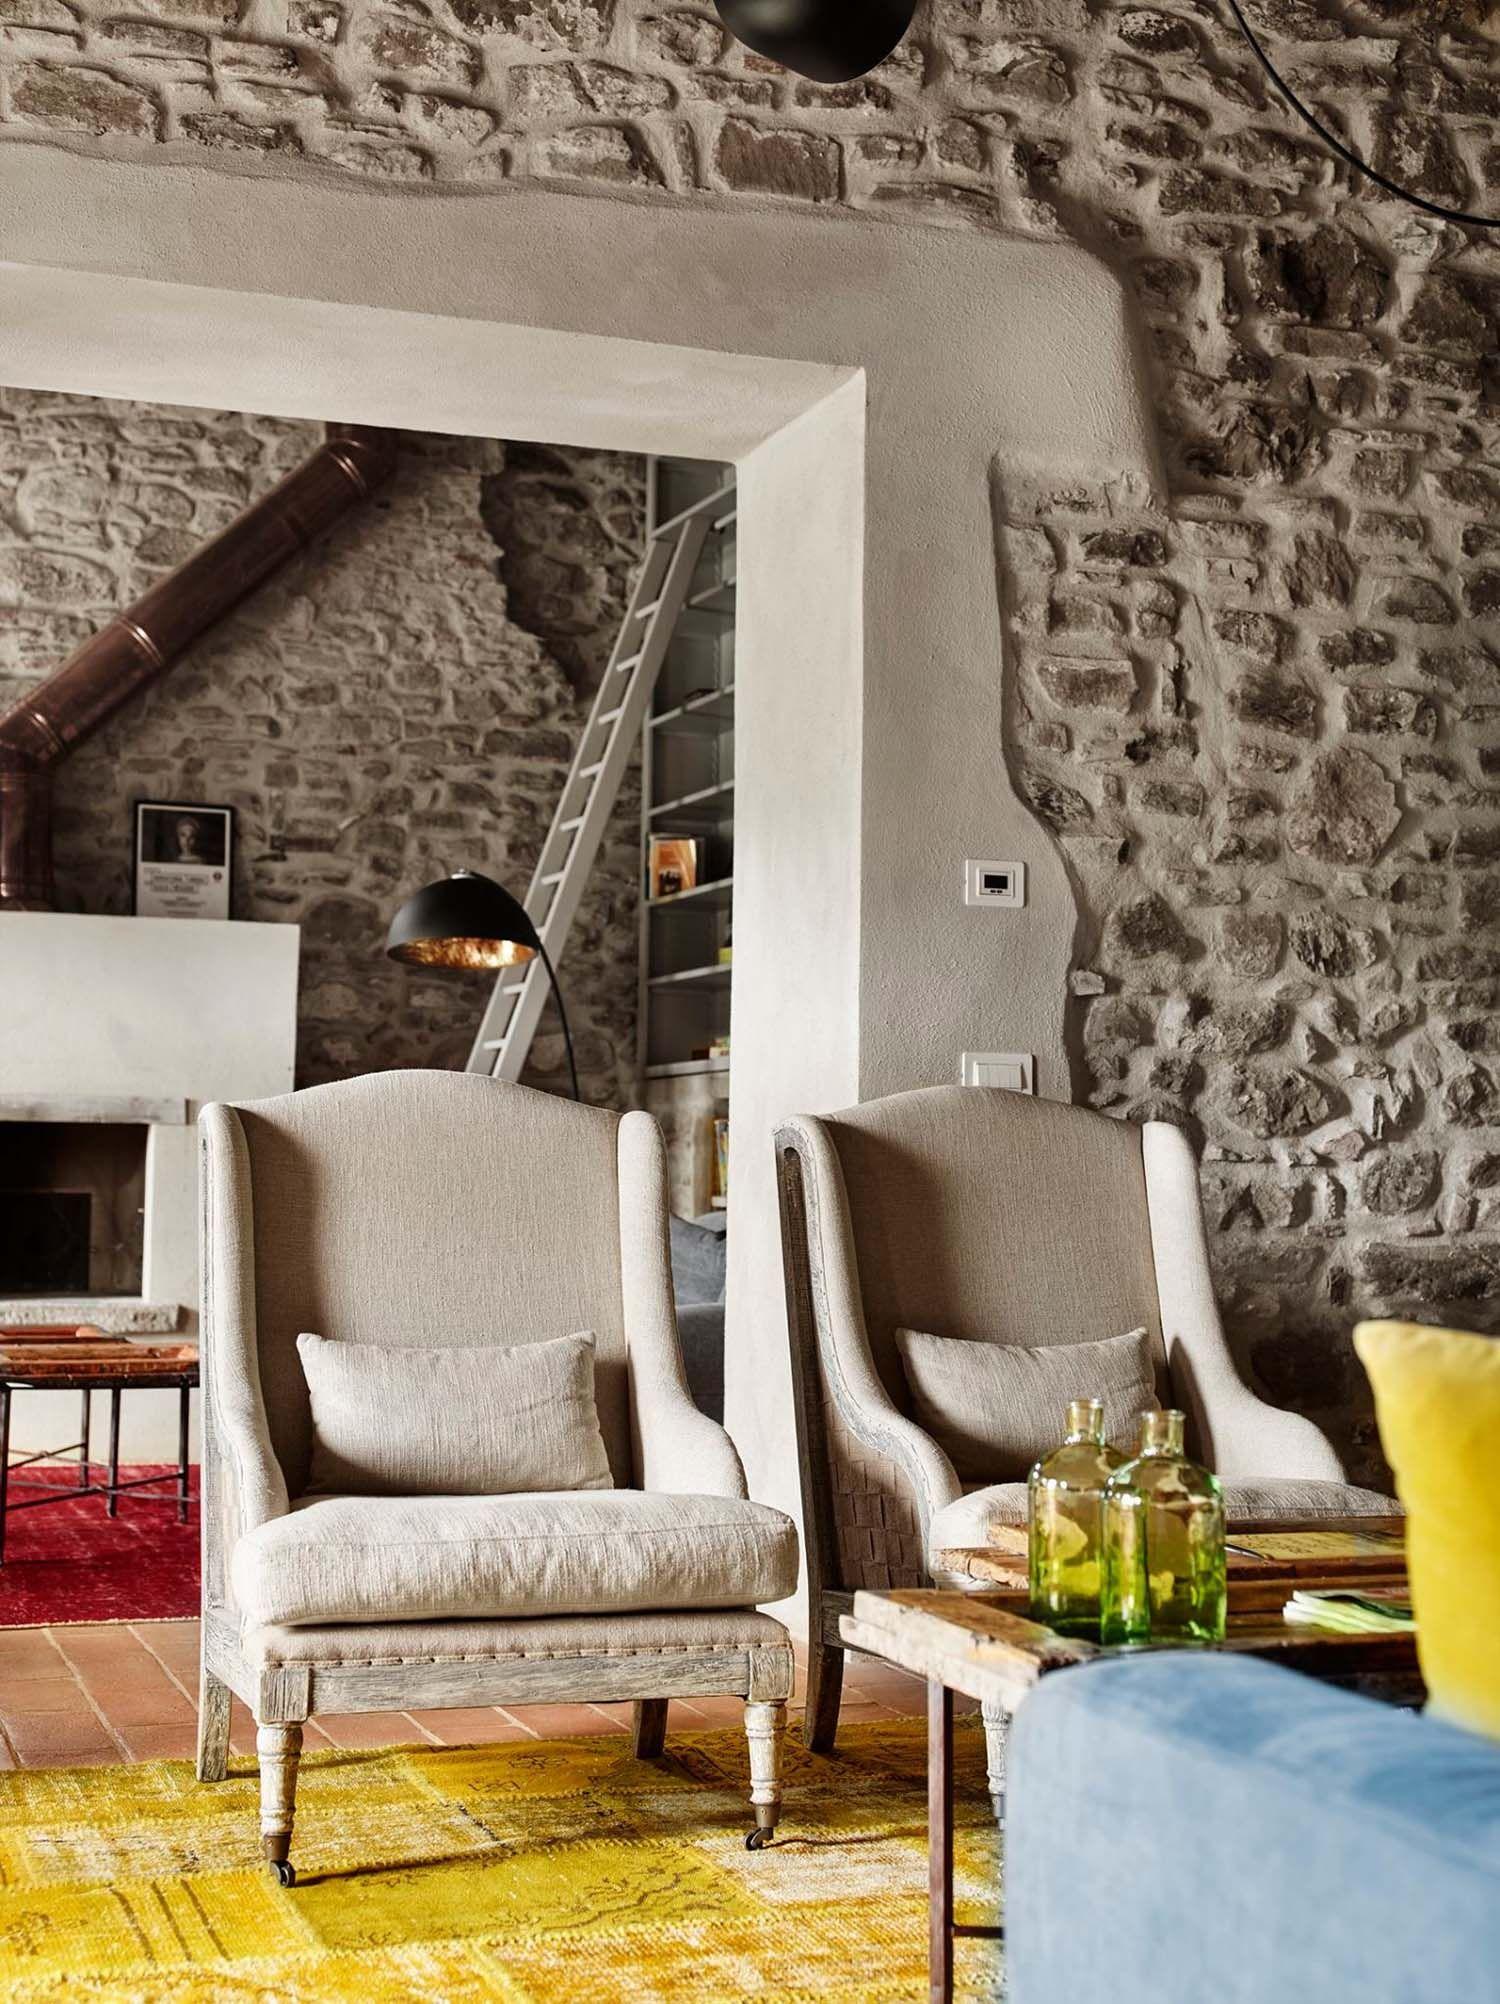 16th Century French Home - 1b0939390420c8b58491e1374f16aa00_Cool 16th Century French Home - 1b0939390420c8b58491e1374f16aa00  2018_39872.jpg